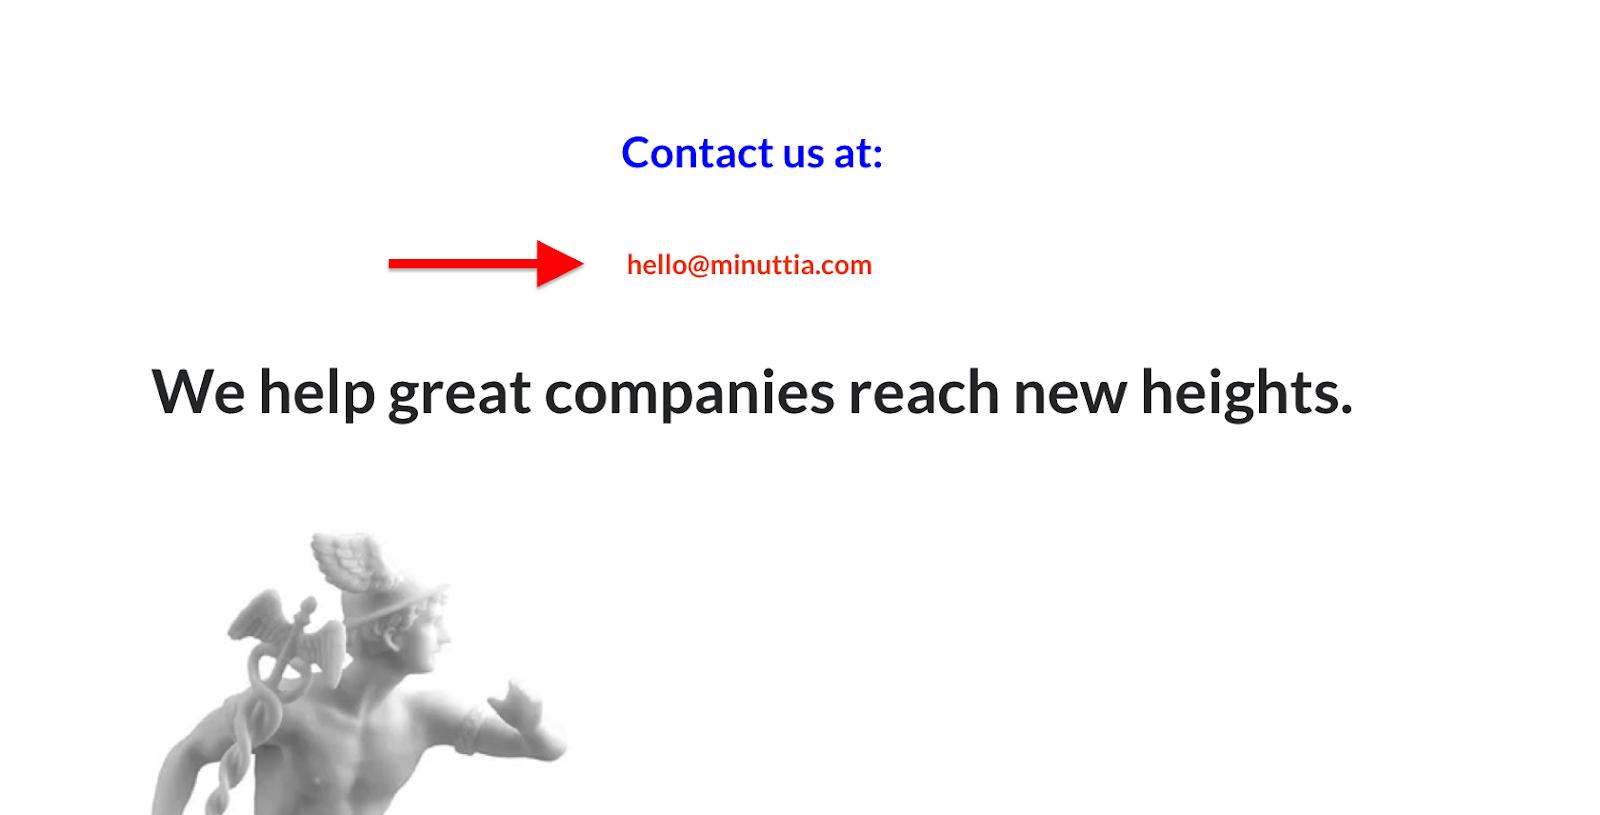 Minuttia contact page